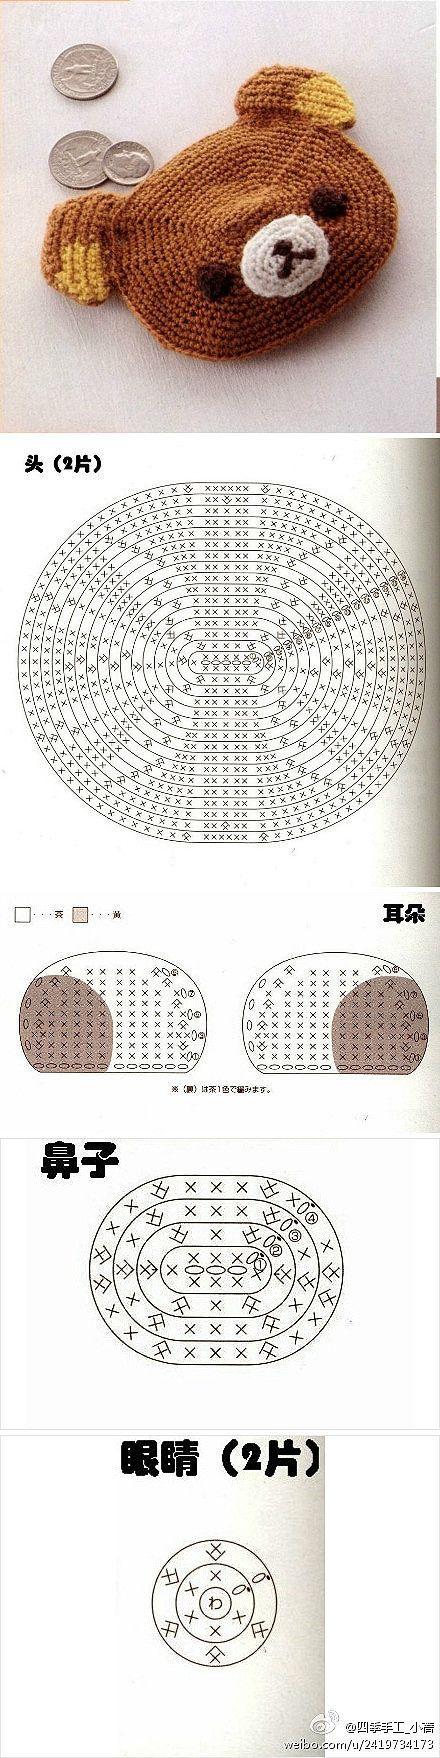 Rilakkuma Coin Purse Crochet Diagram